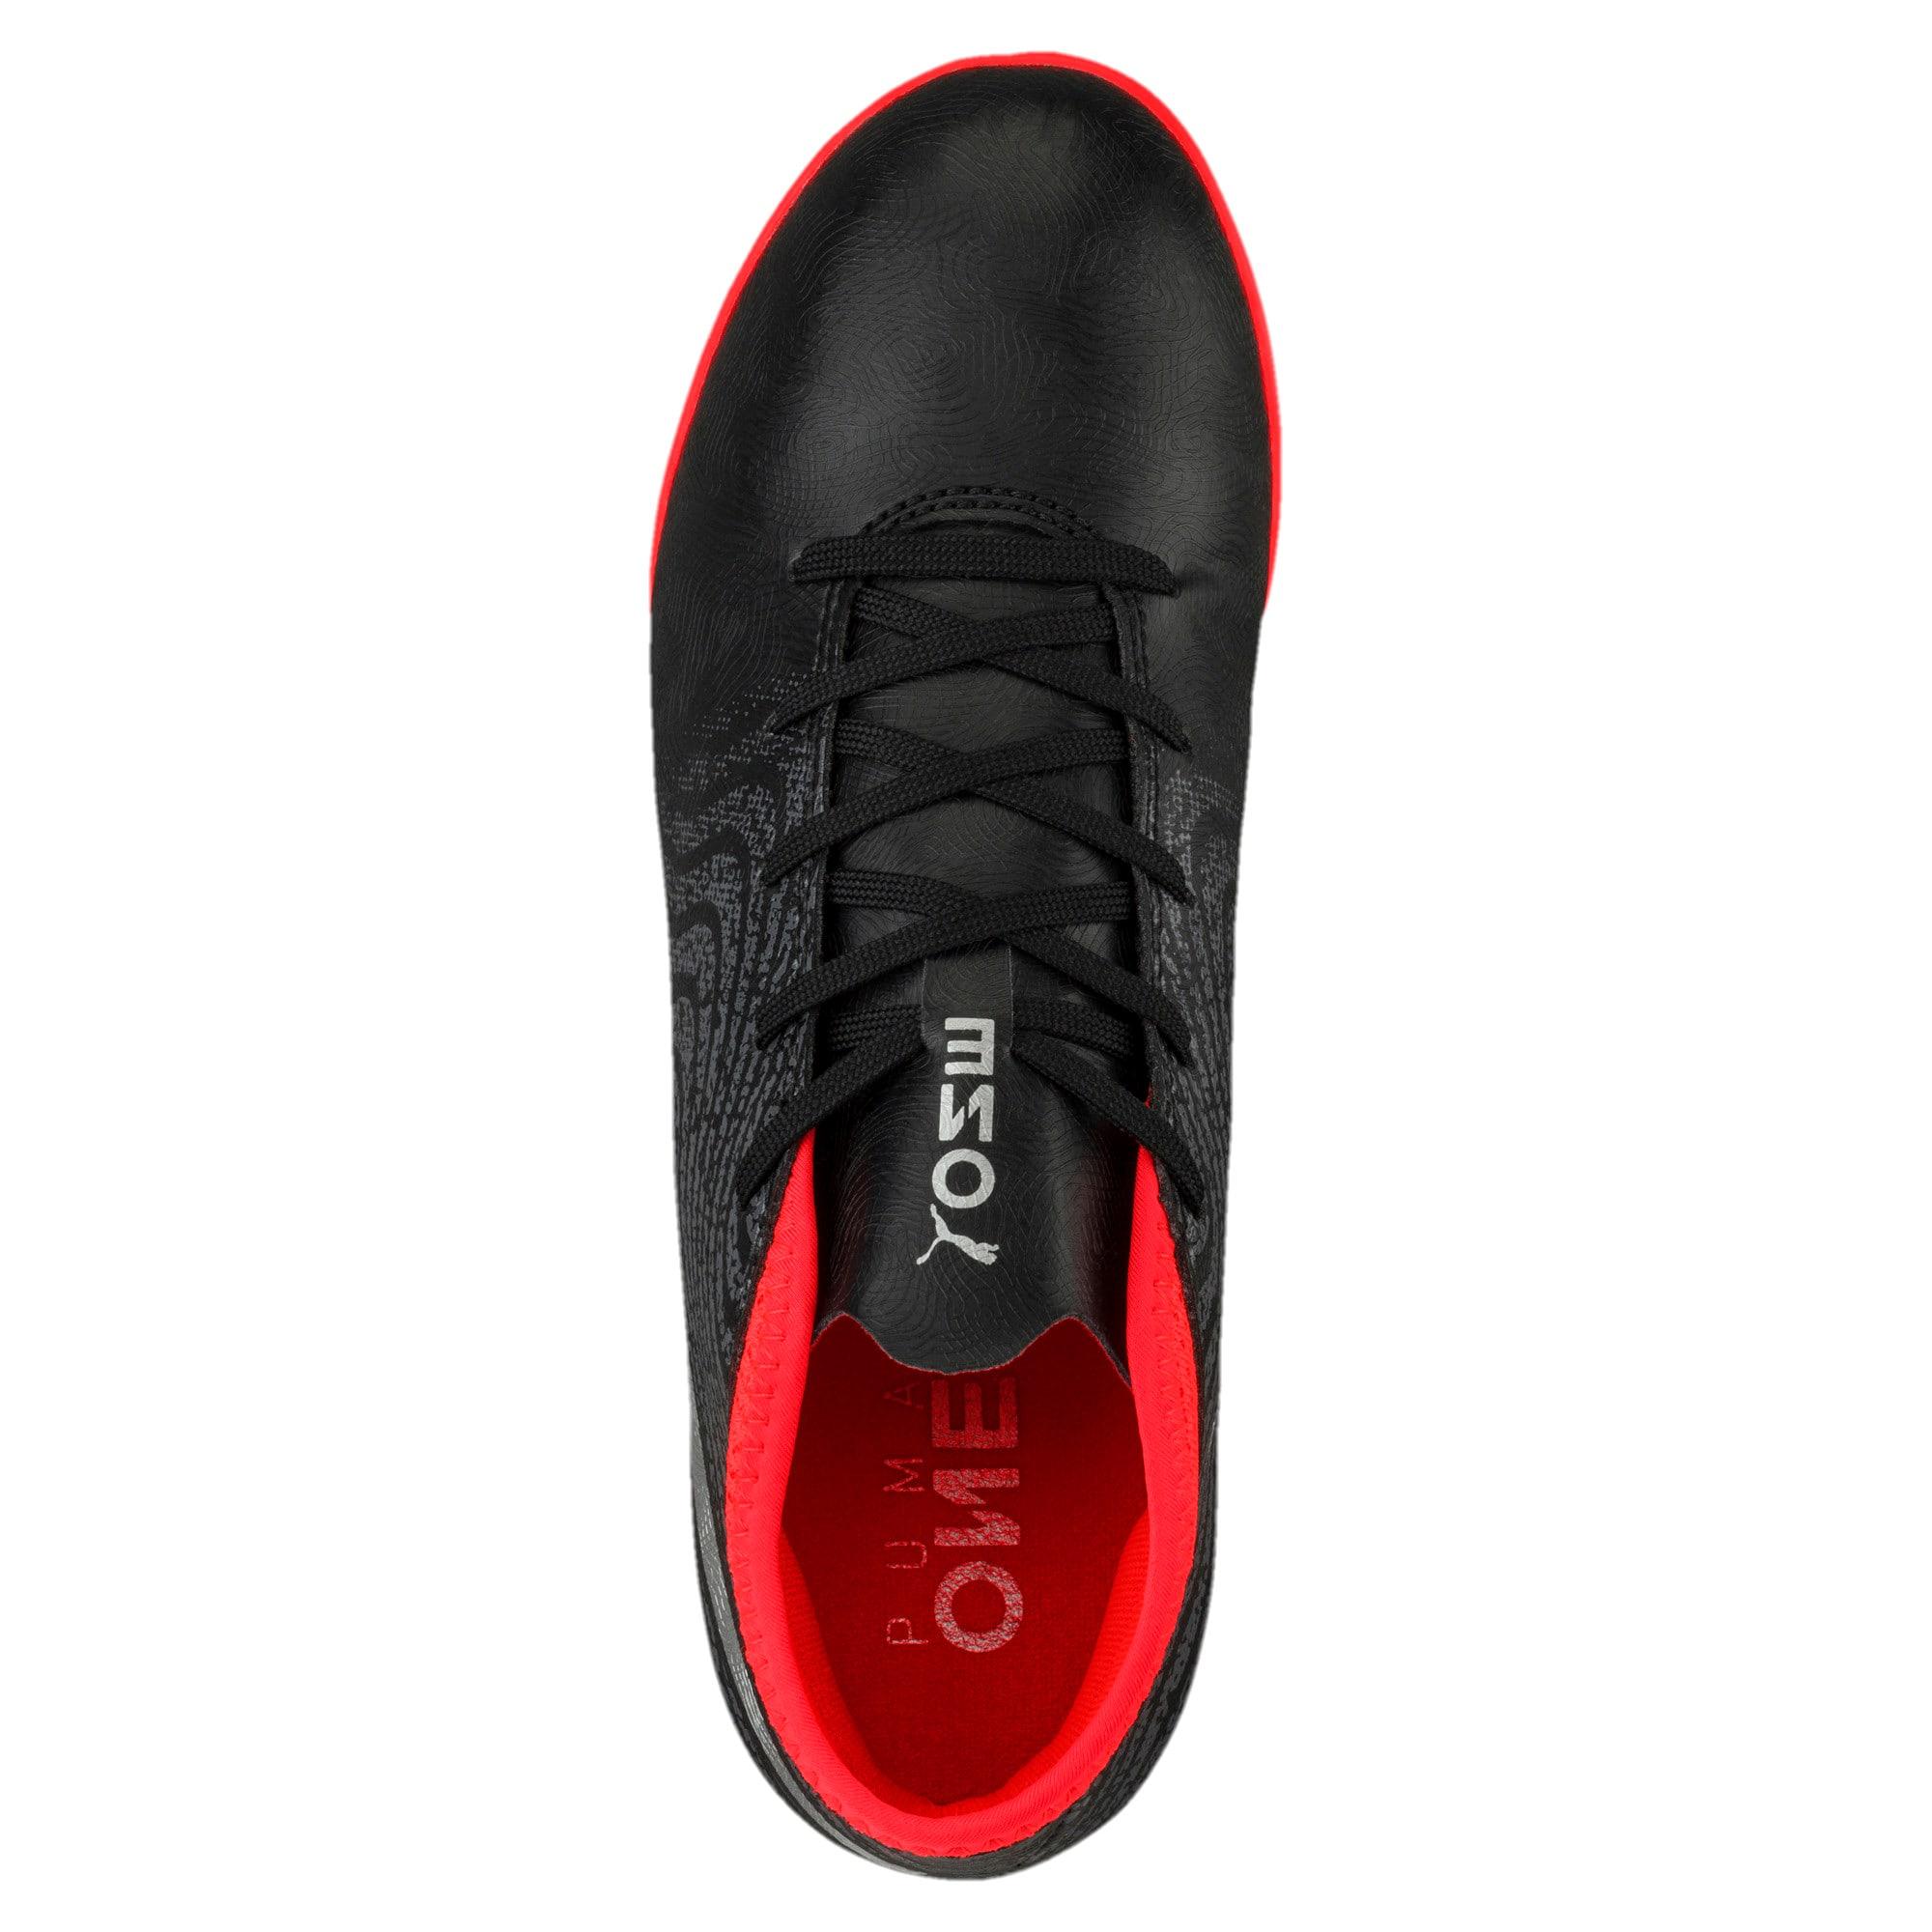 Thumbnail 5 of ONE 18.4 TT Jr Football Boots, Black-Silver-Red, medium-IND